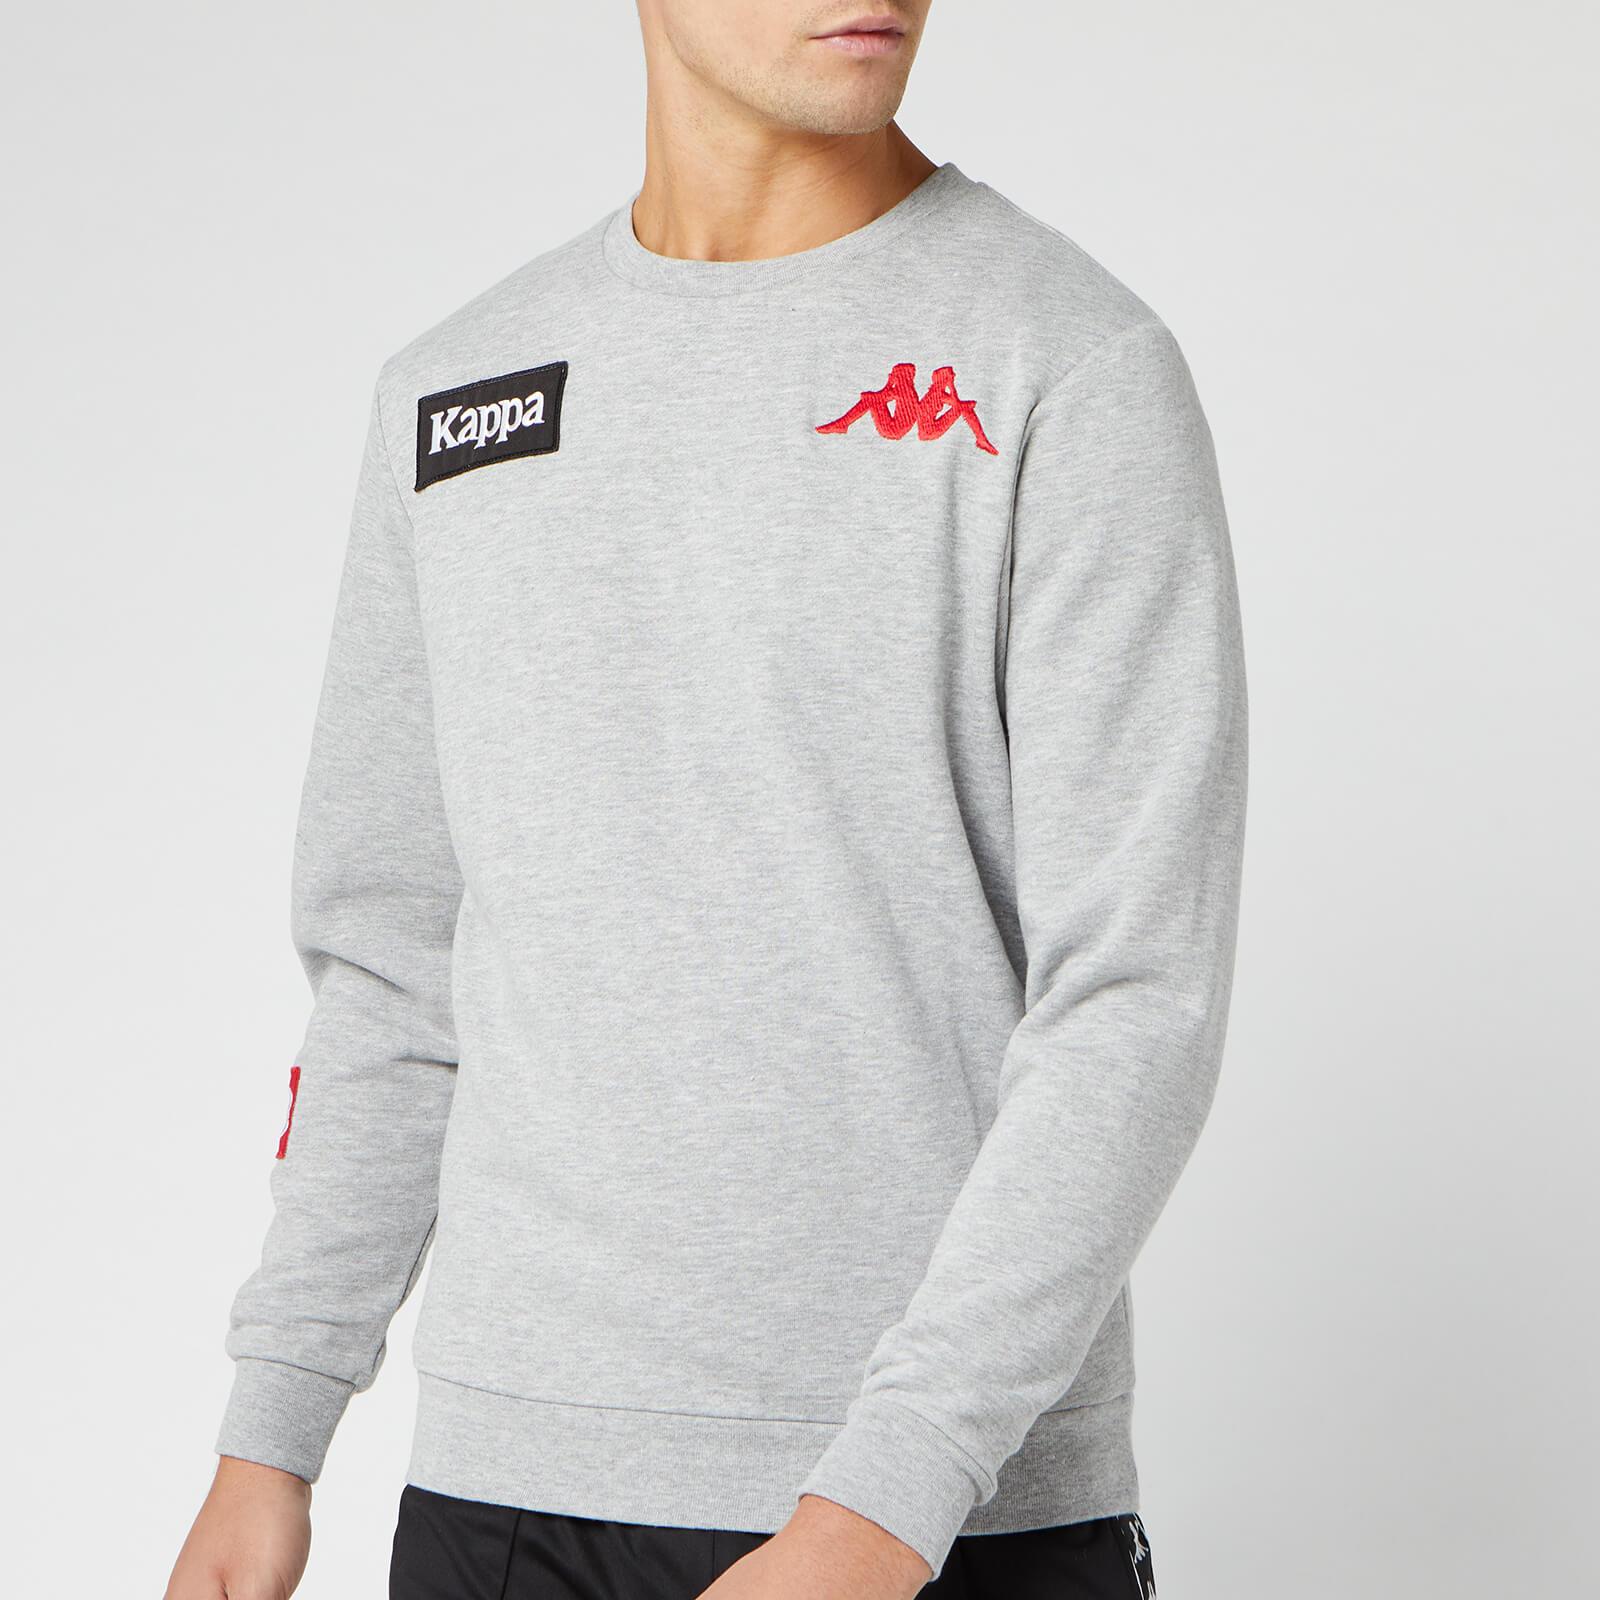 Kappa Men's Authentic La Bayza USA Sweatshirt - Grey Melange - L